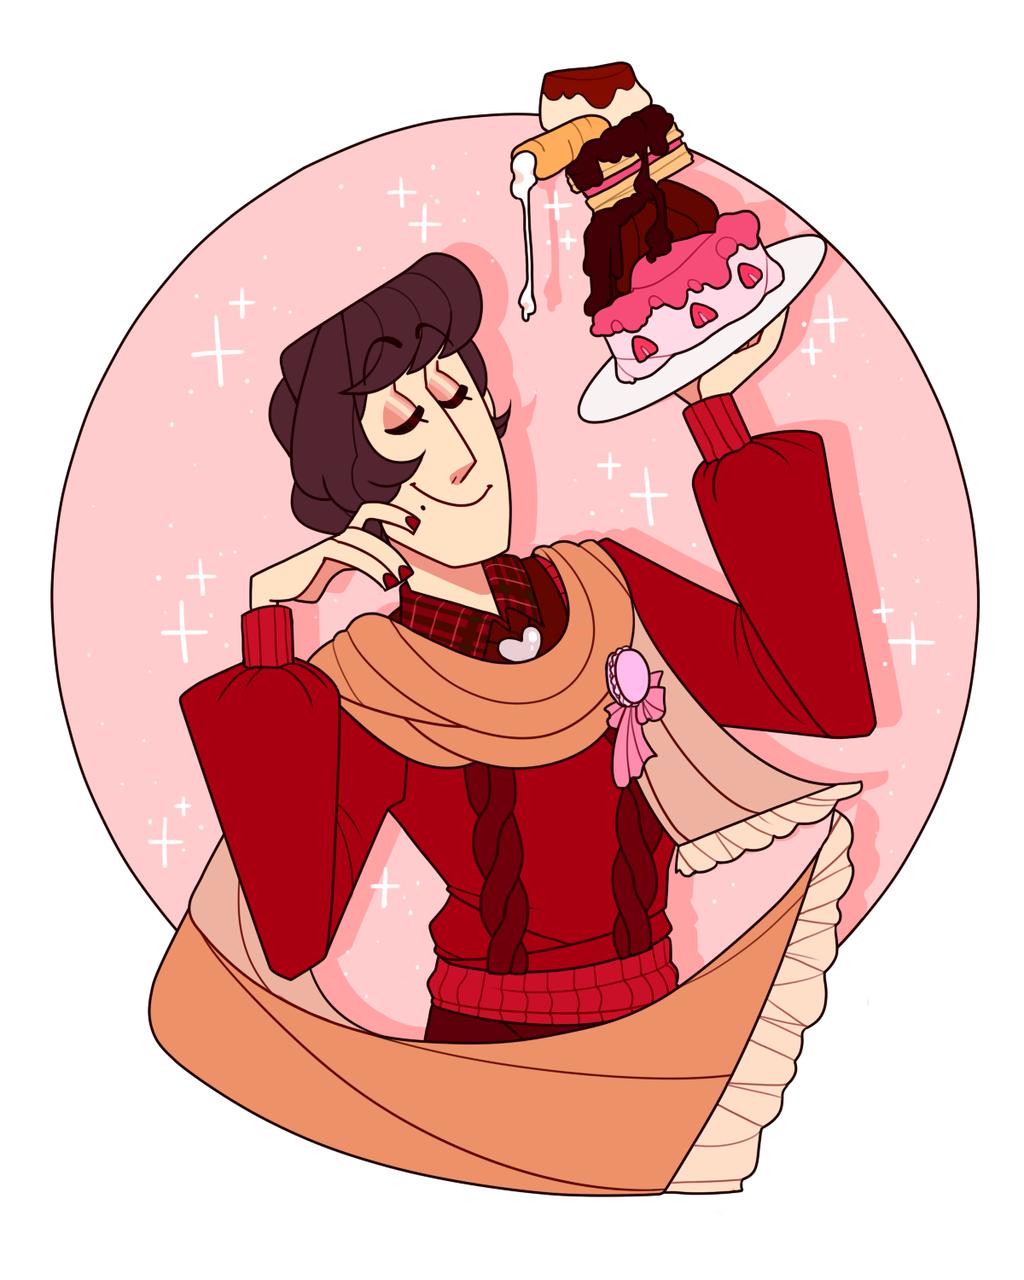 Let's bake! by Loveliestprince